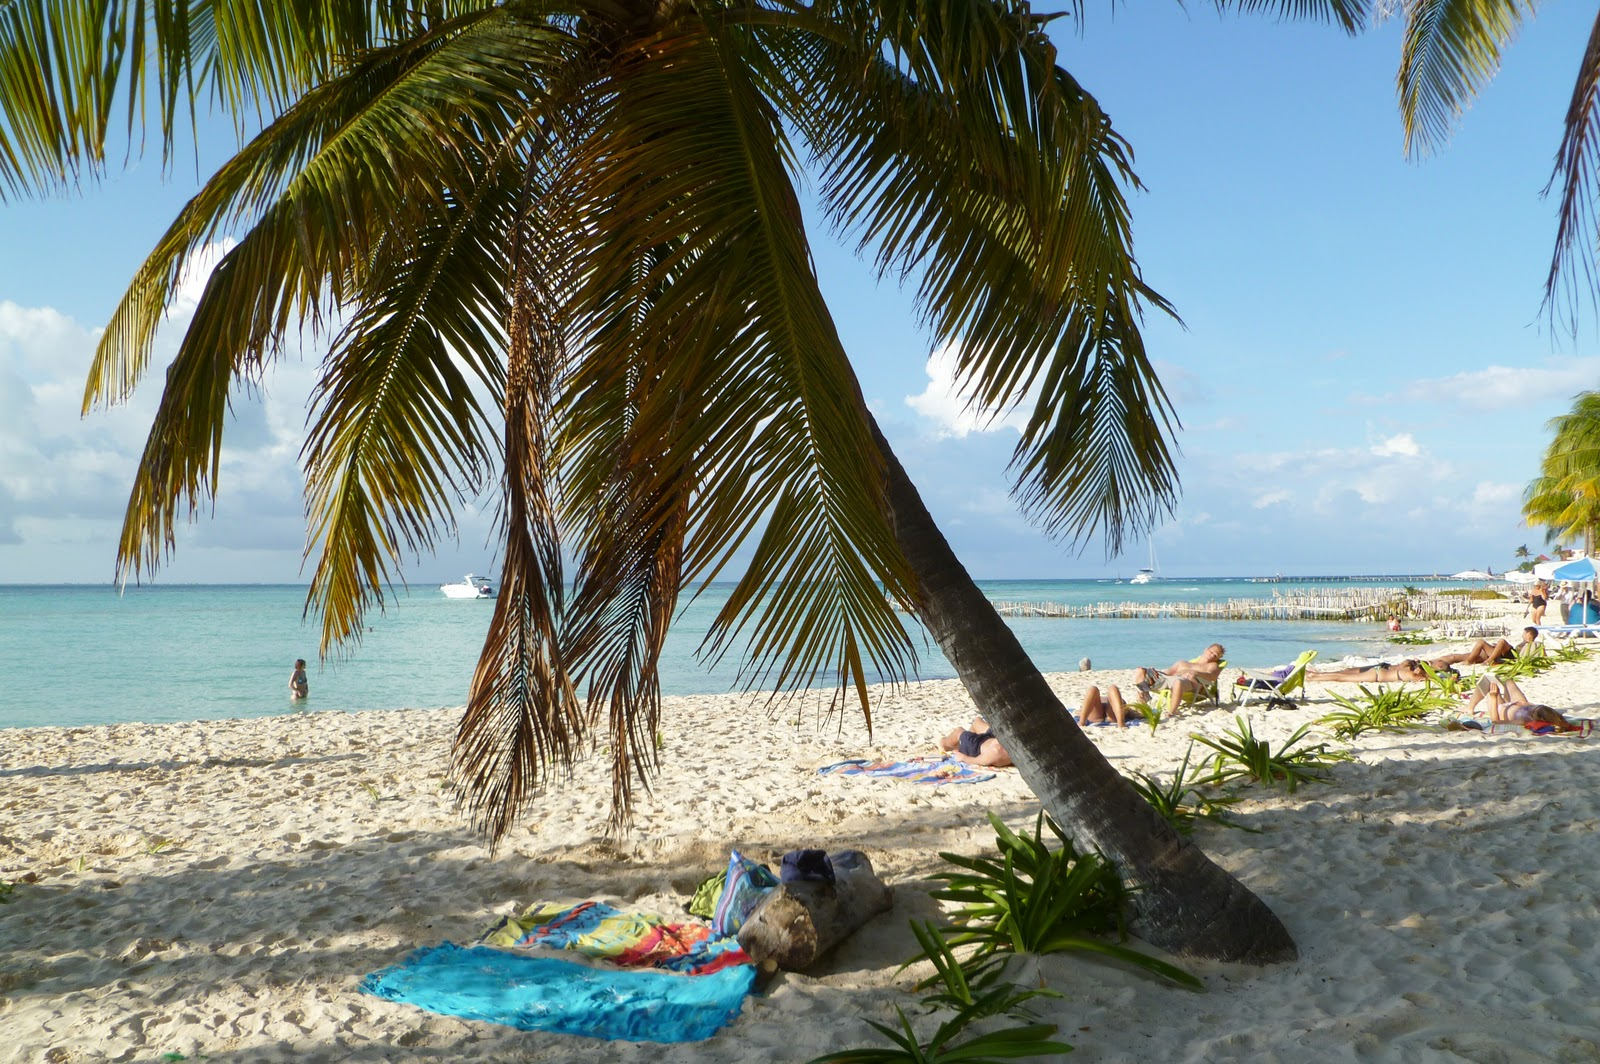 life 39 s a beach favorite beach shots. Black Bedroom Furniture Sets. Home Design Ideas